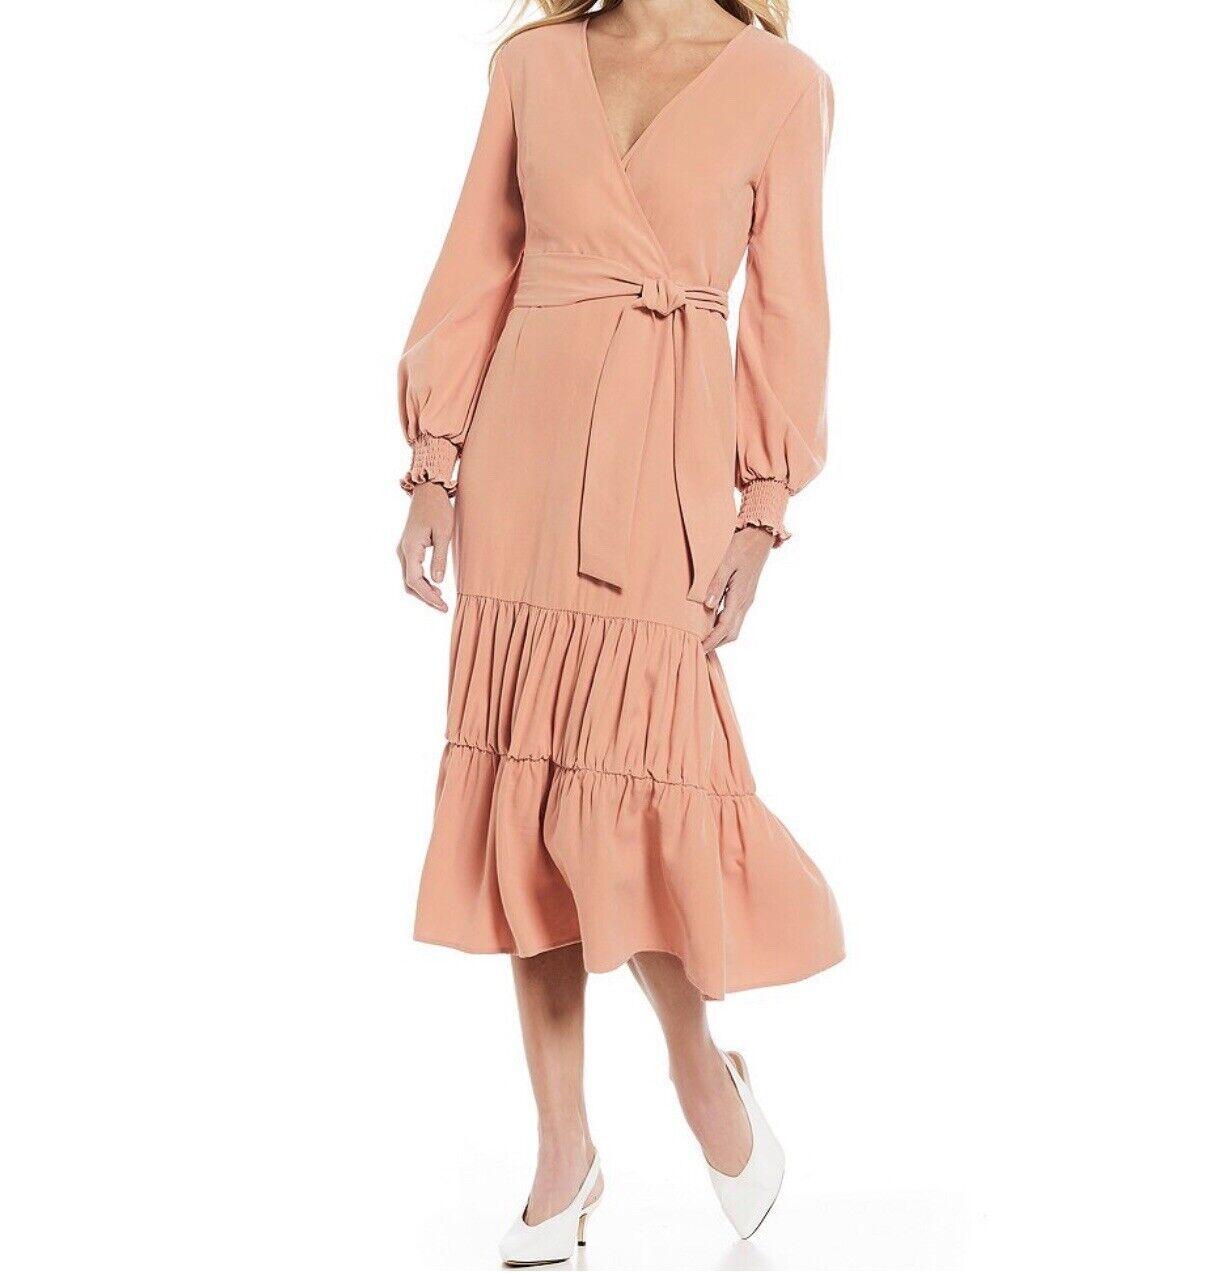 Gianni Bini Wrap Midi Dress Coral Peach Farbe Größe Small Elegant